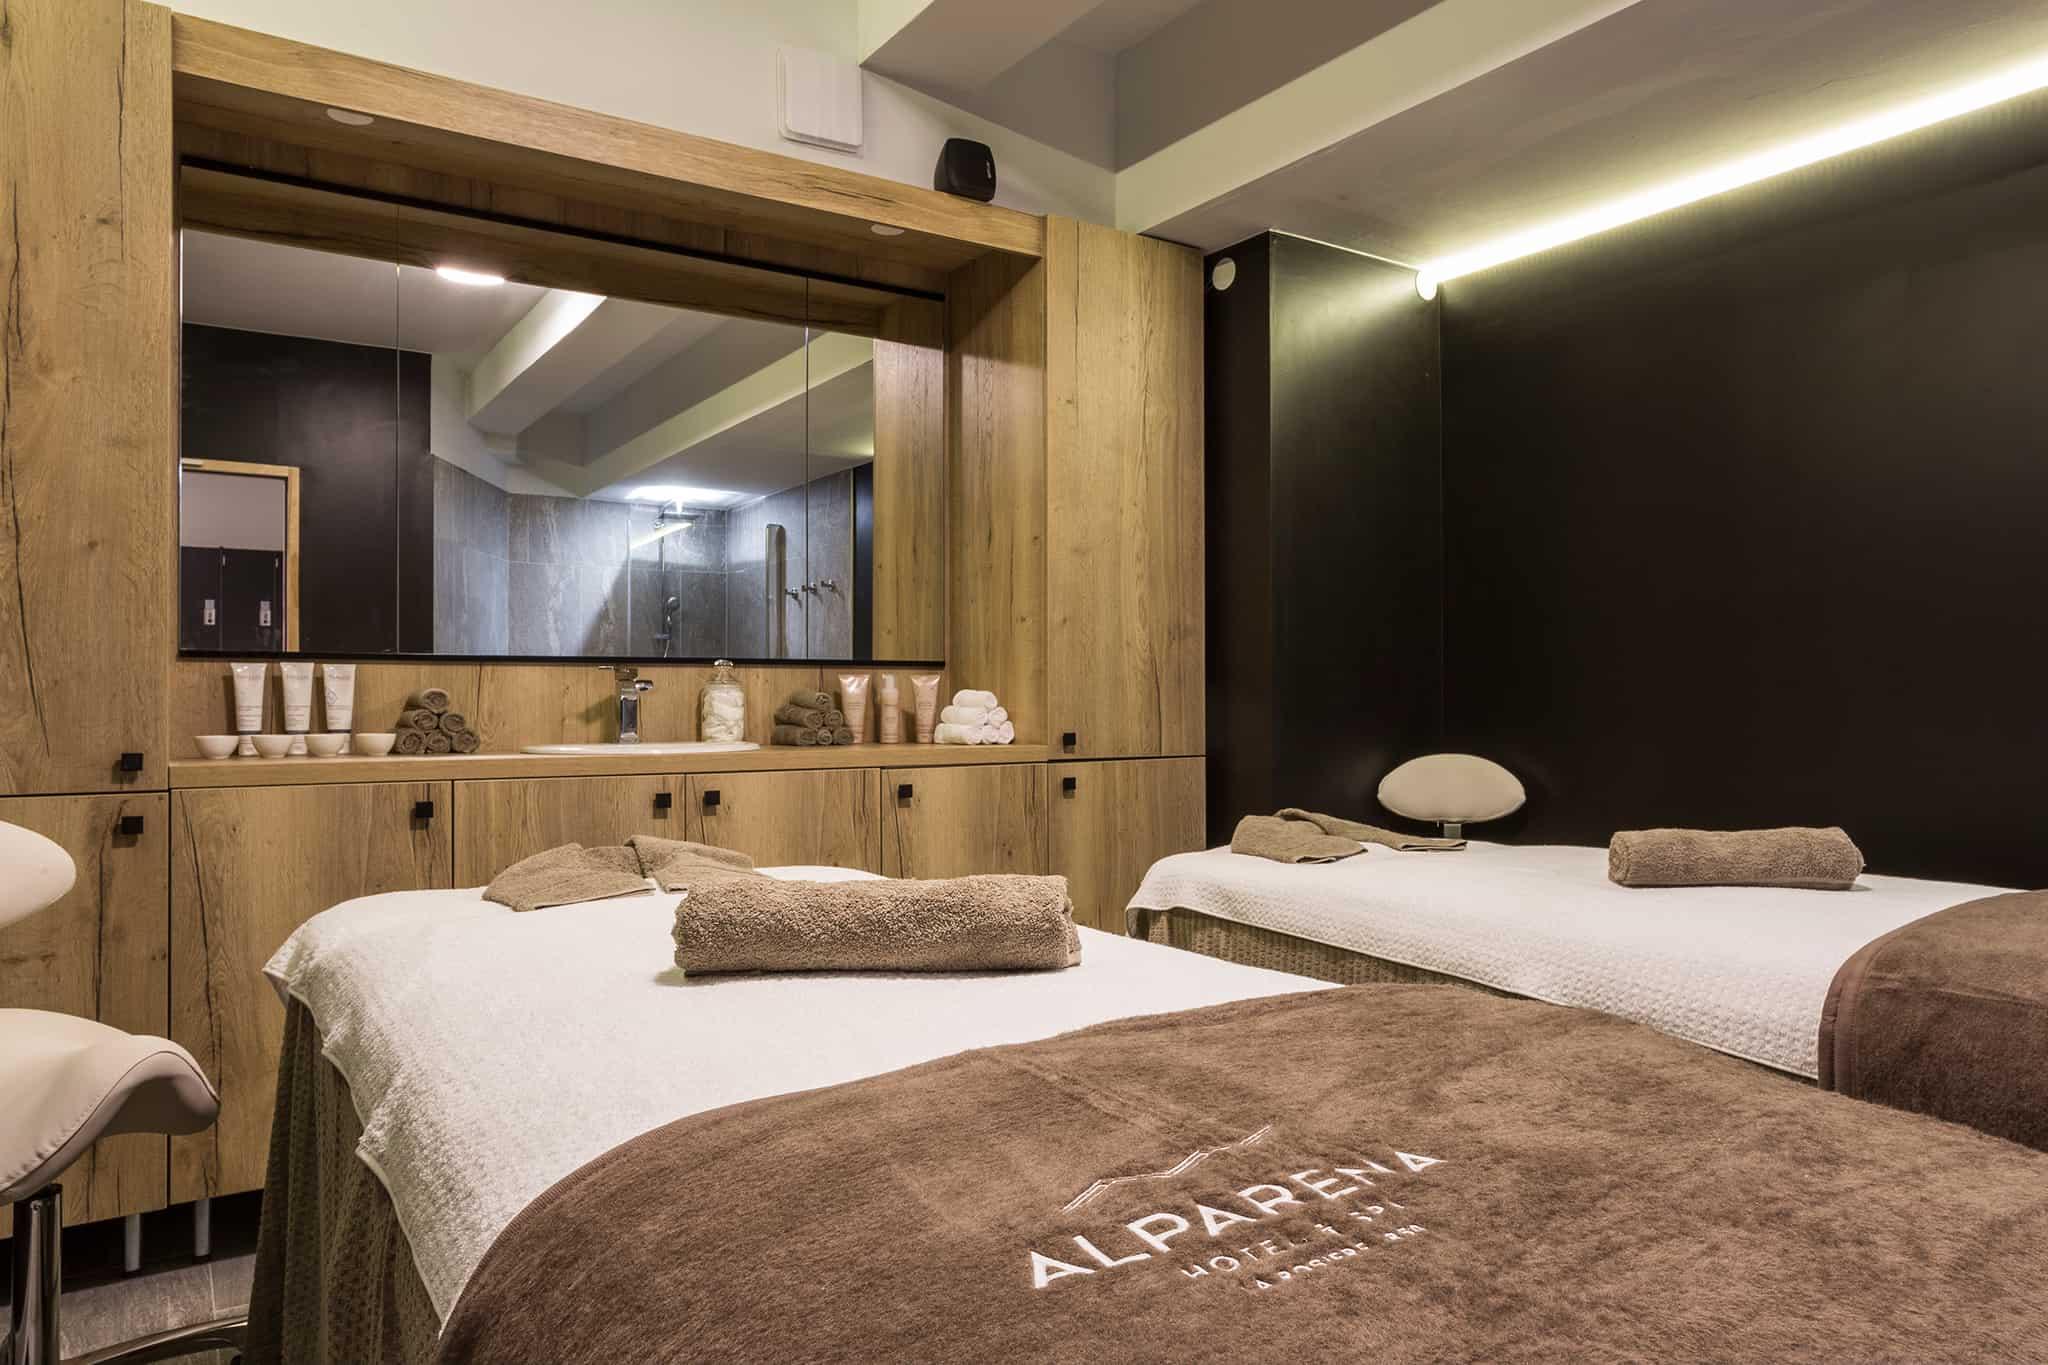 Spa -Soins - 1 - Hôtel Alparena